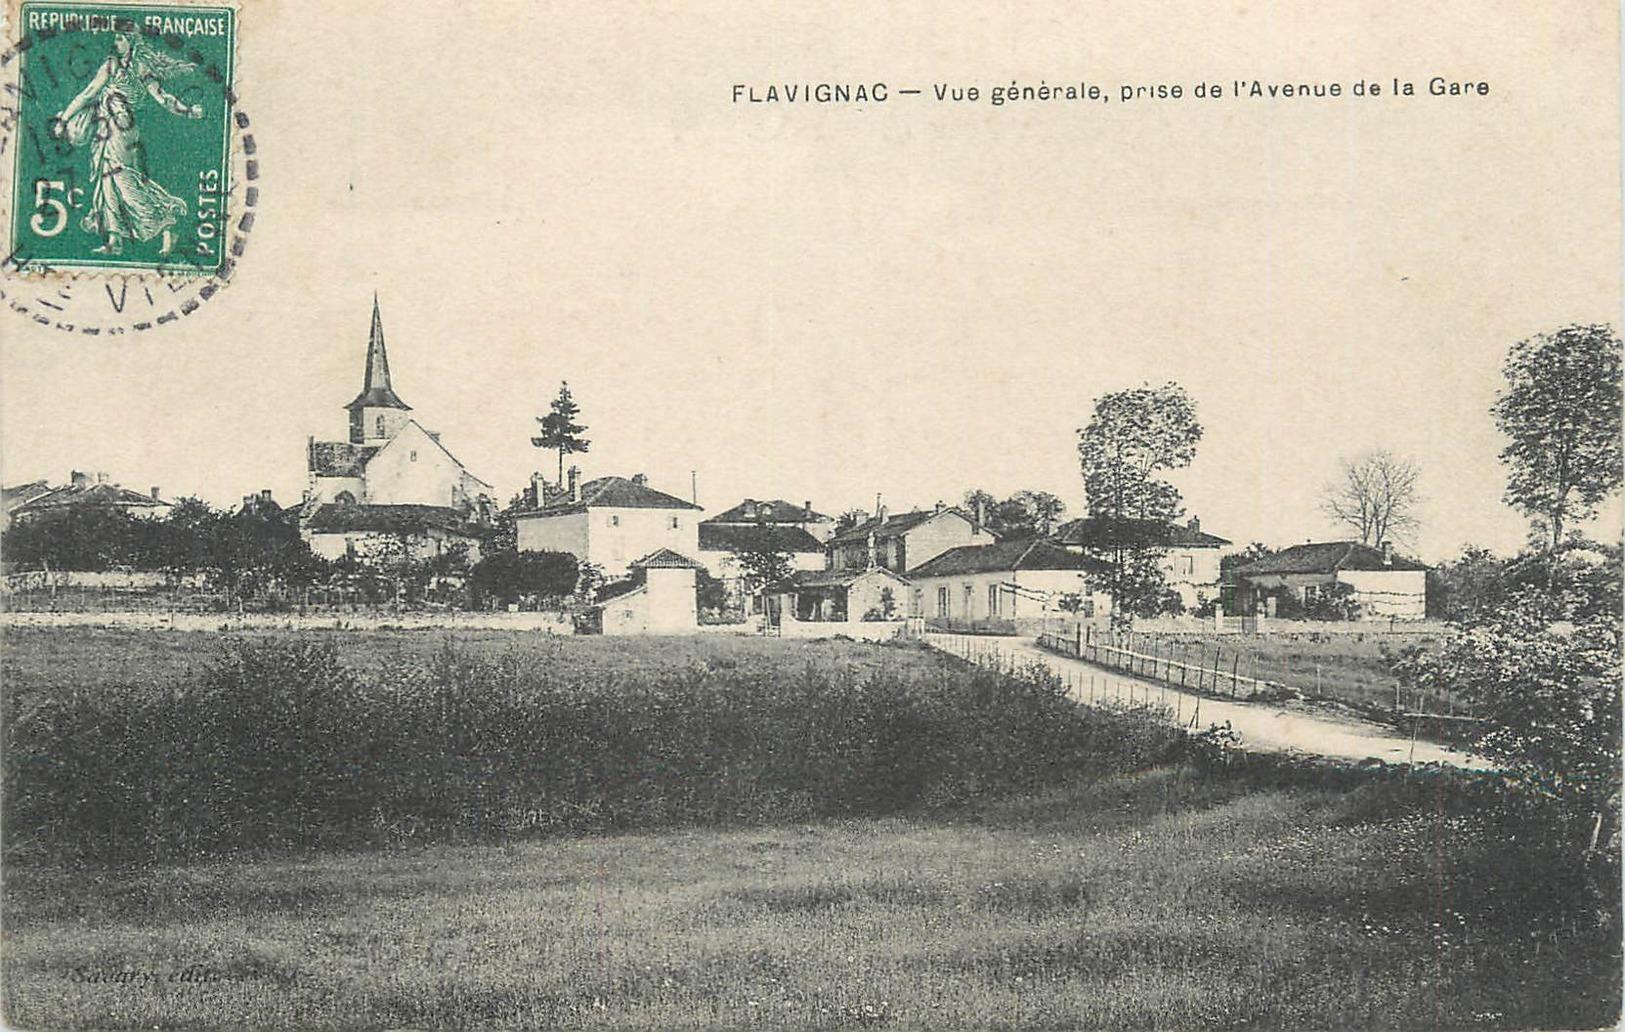 Flavignac 8